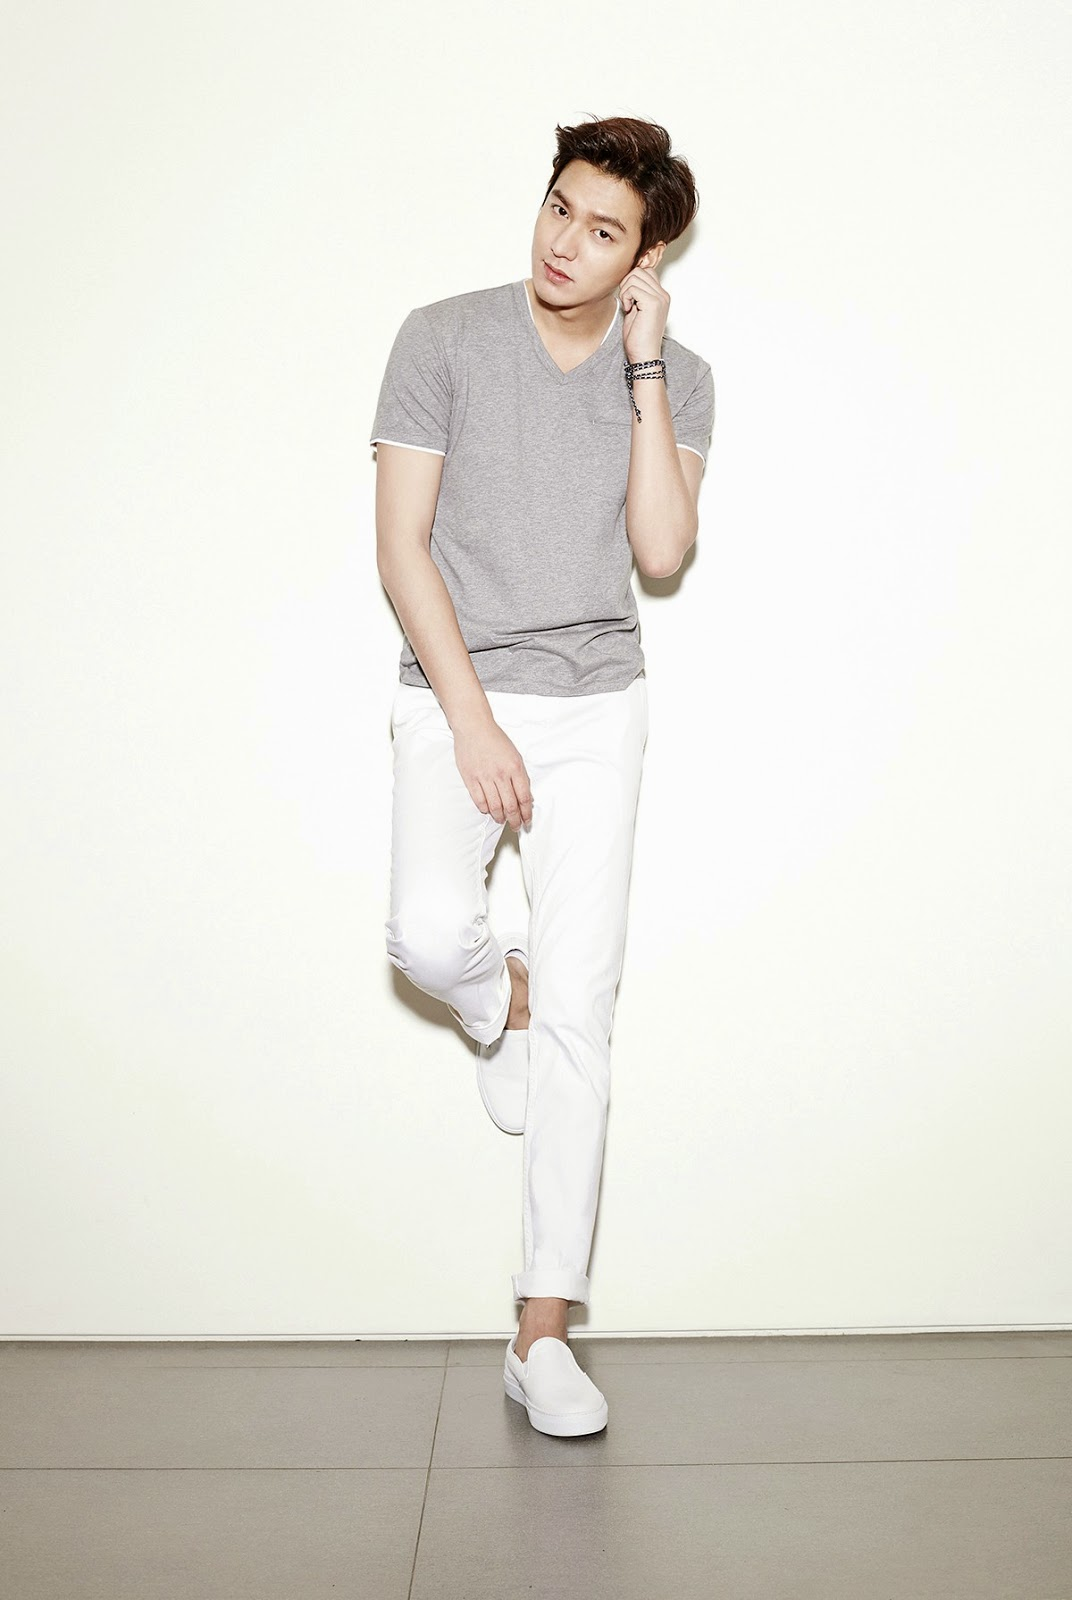 Falling Apart Wallpaper The Imaginary World Of Monika Lee Min Ho For Tngt Fashion